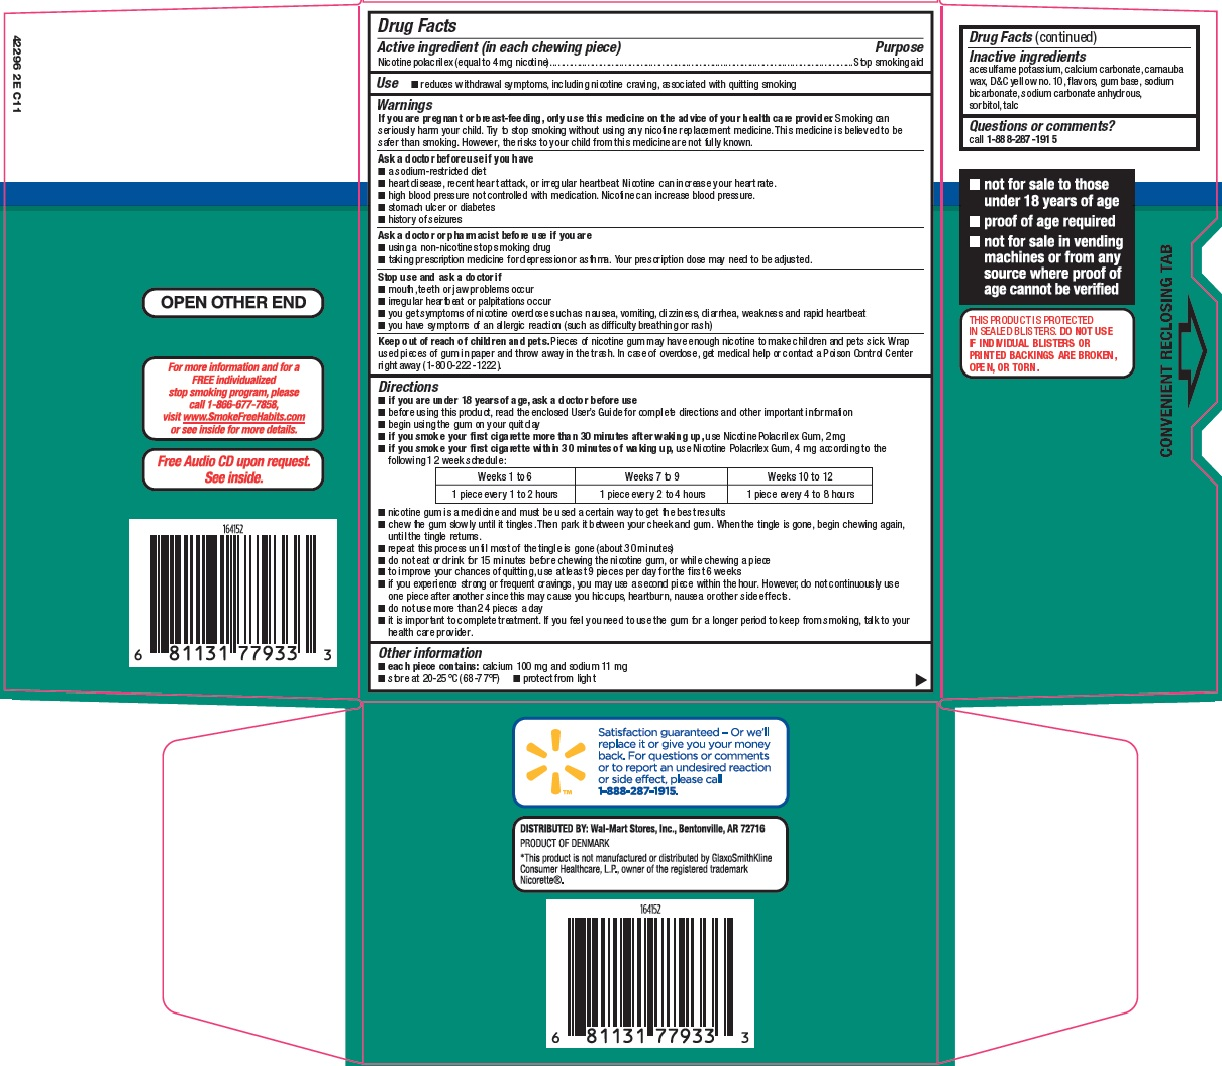 nicotine gum image 2